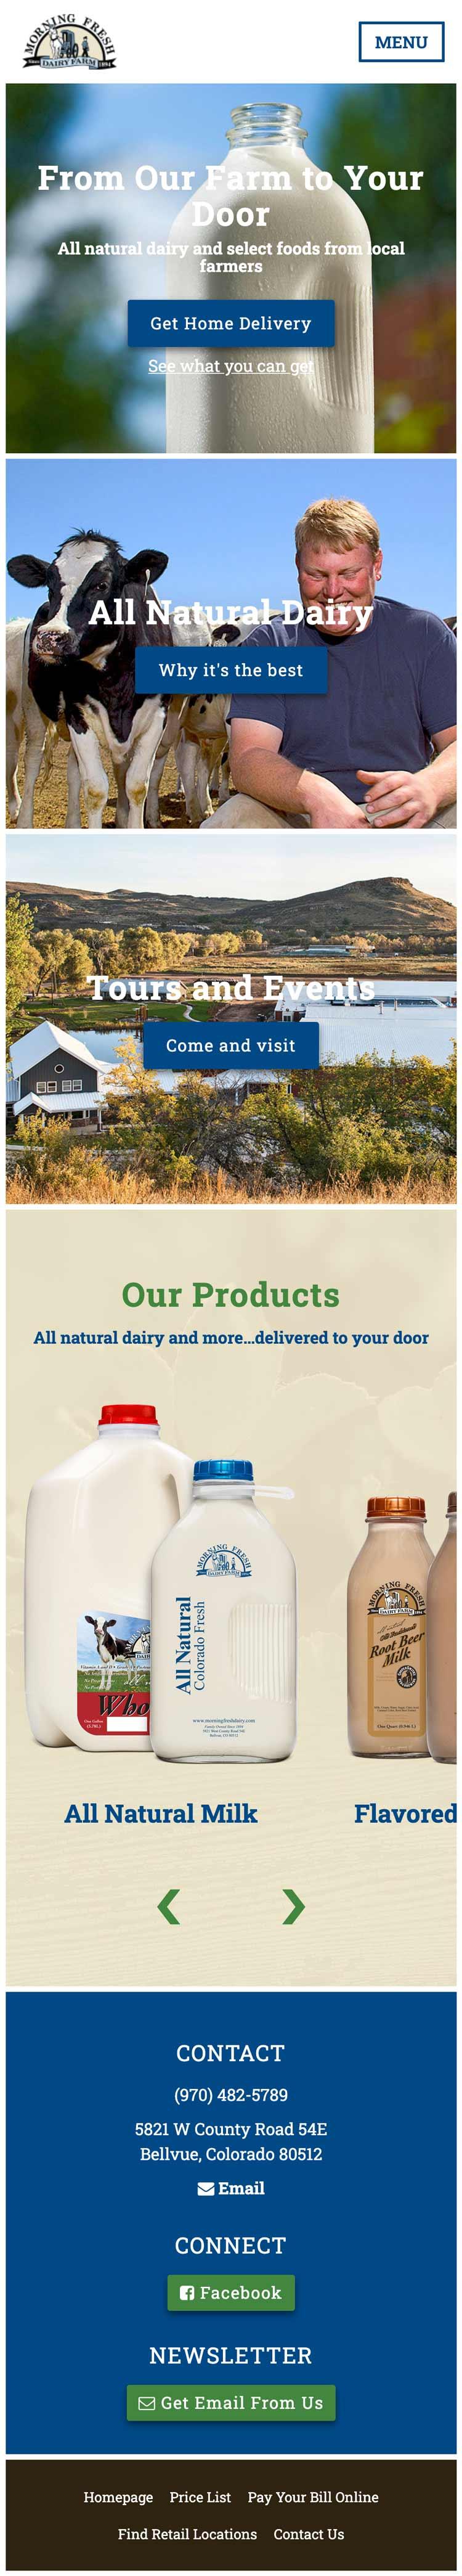 Morning Fresh Dairy - Dairy Website Design